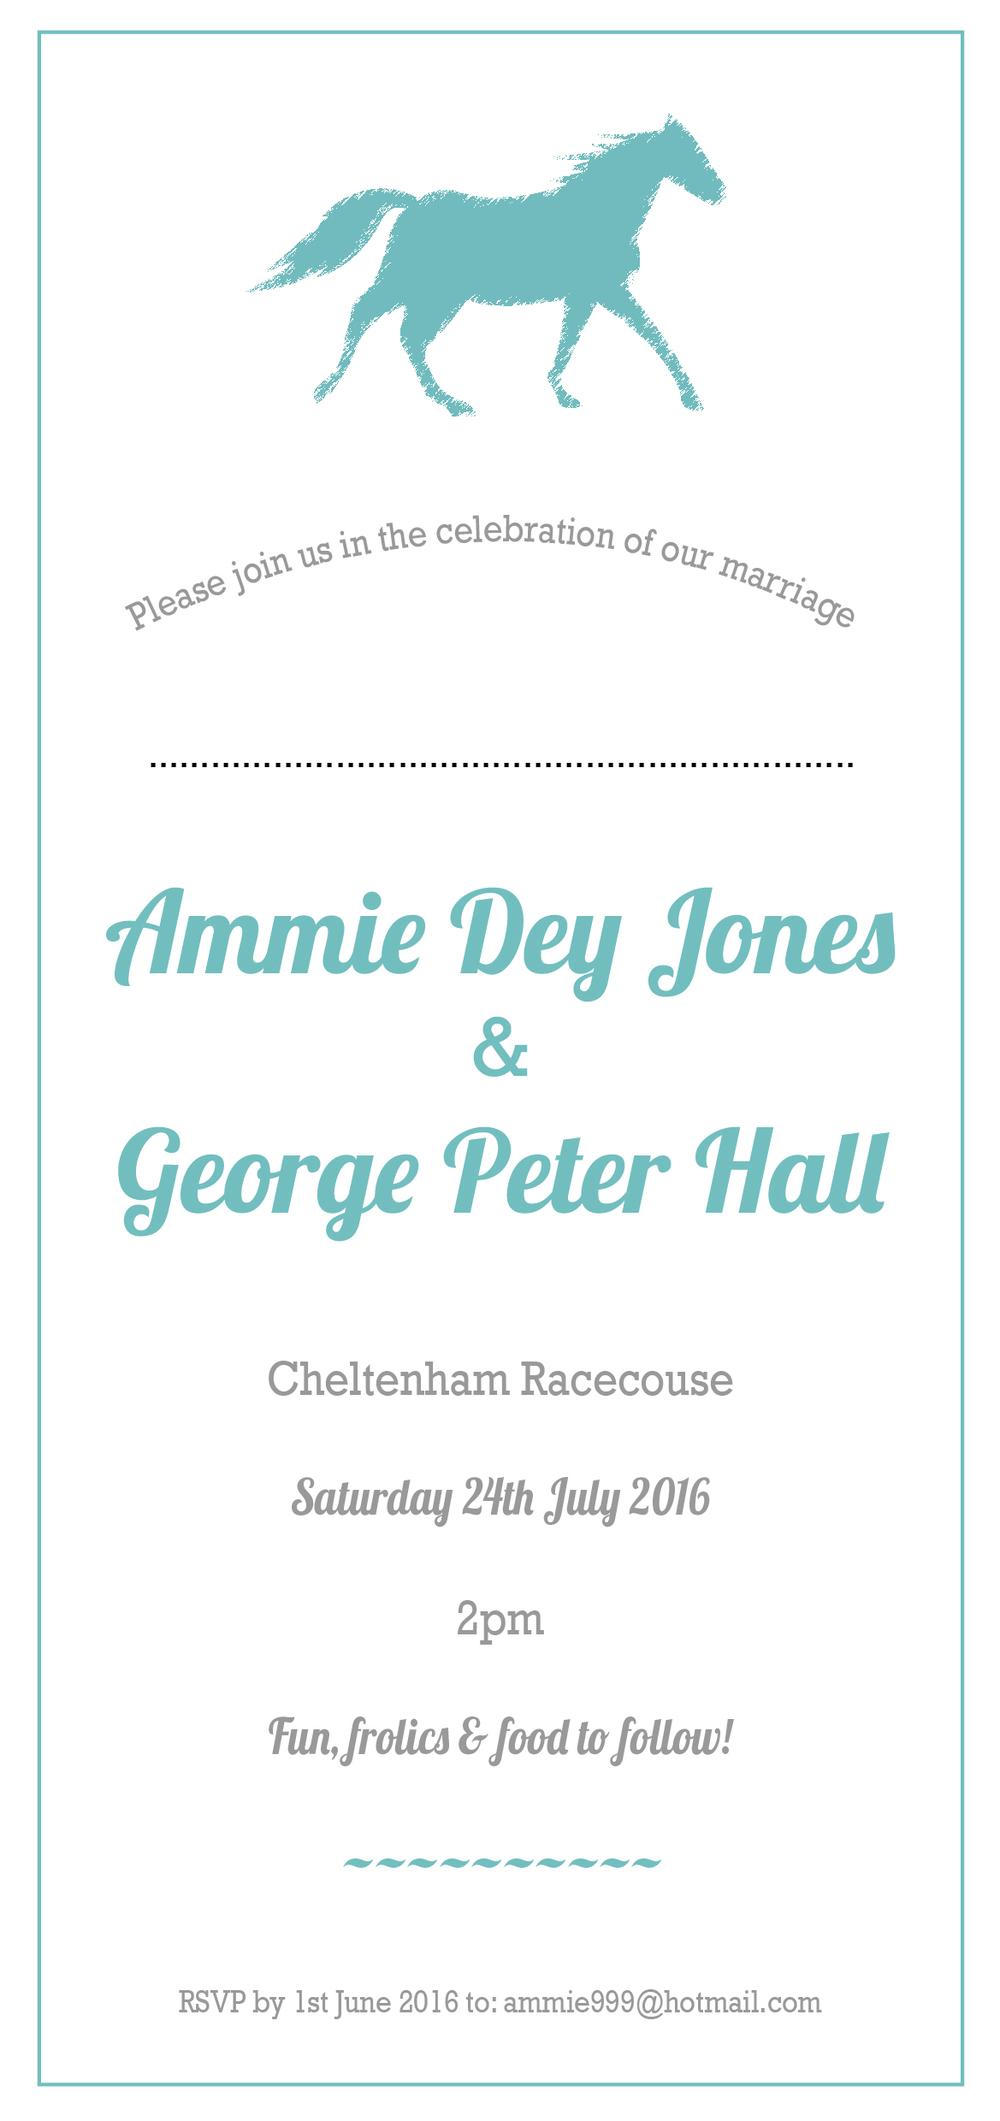 cheltenham racecourse invite